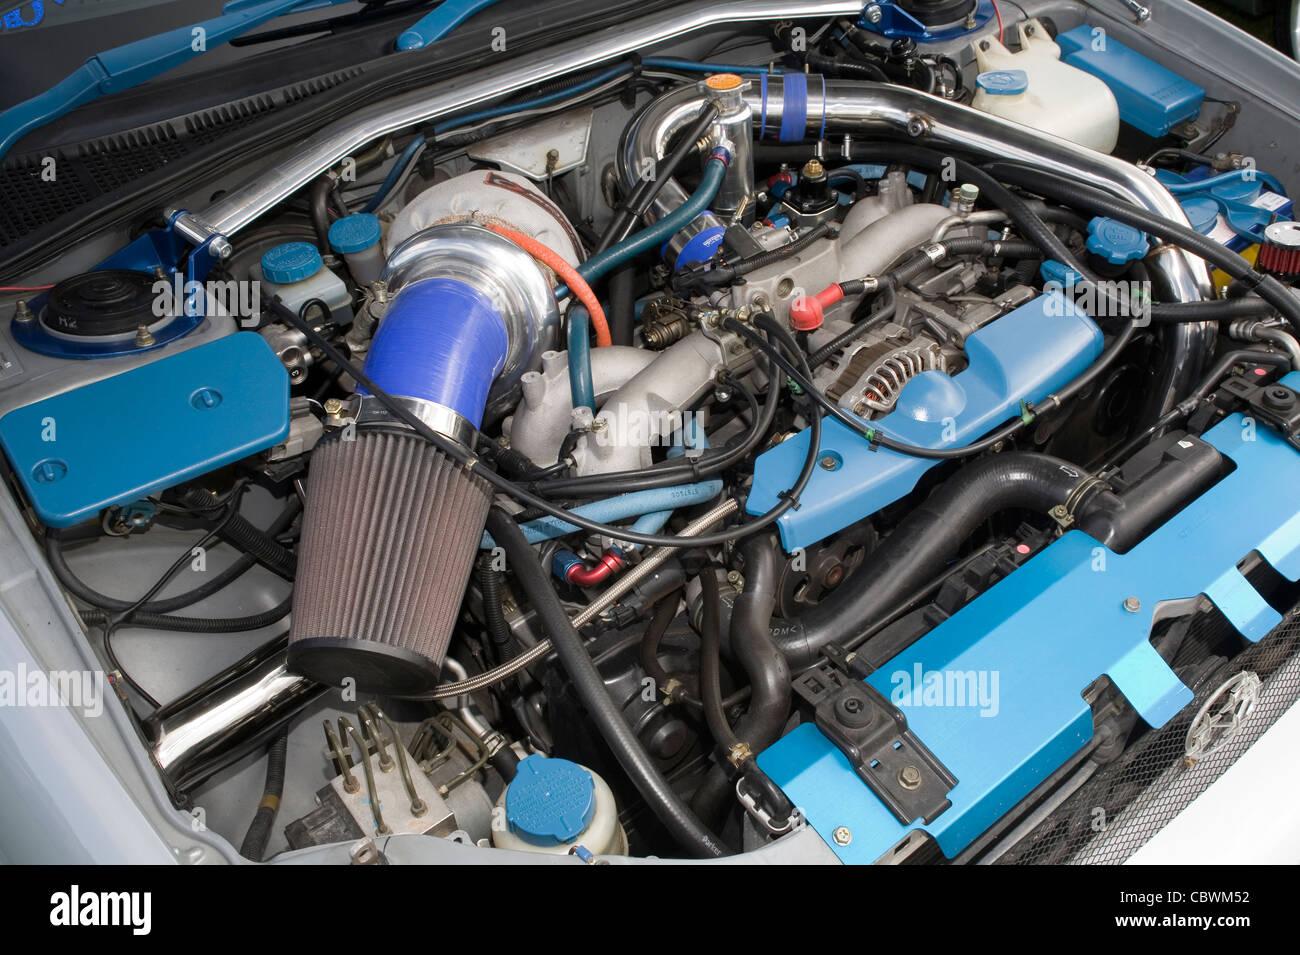 Modified And Custom Subaru Ej 20 Wrx Engine With Large Turbocharger Stock Photo 41746574 Alamy